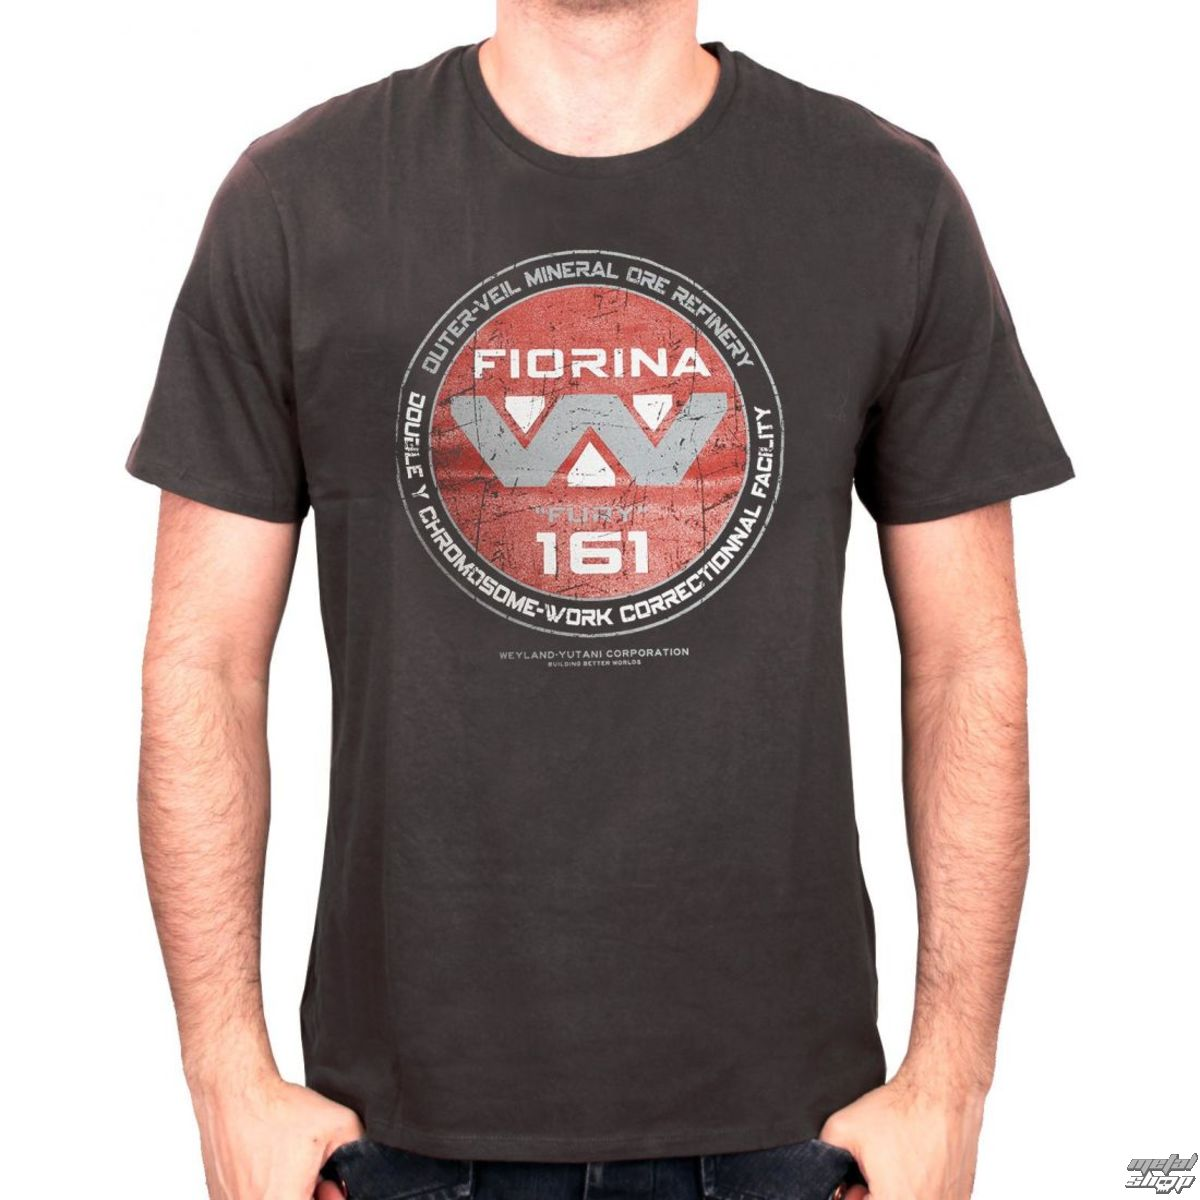 520dd3924050 tričko pánské ALIEN - FIORINA 161 - GREY - LEGEND - MEALINDTS022 -  metal-shop.eu